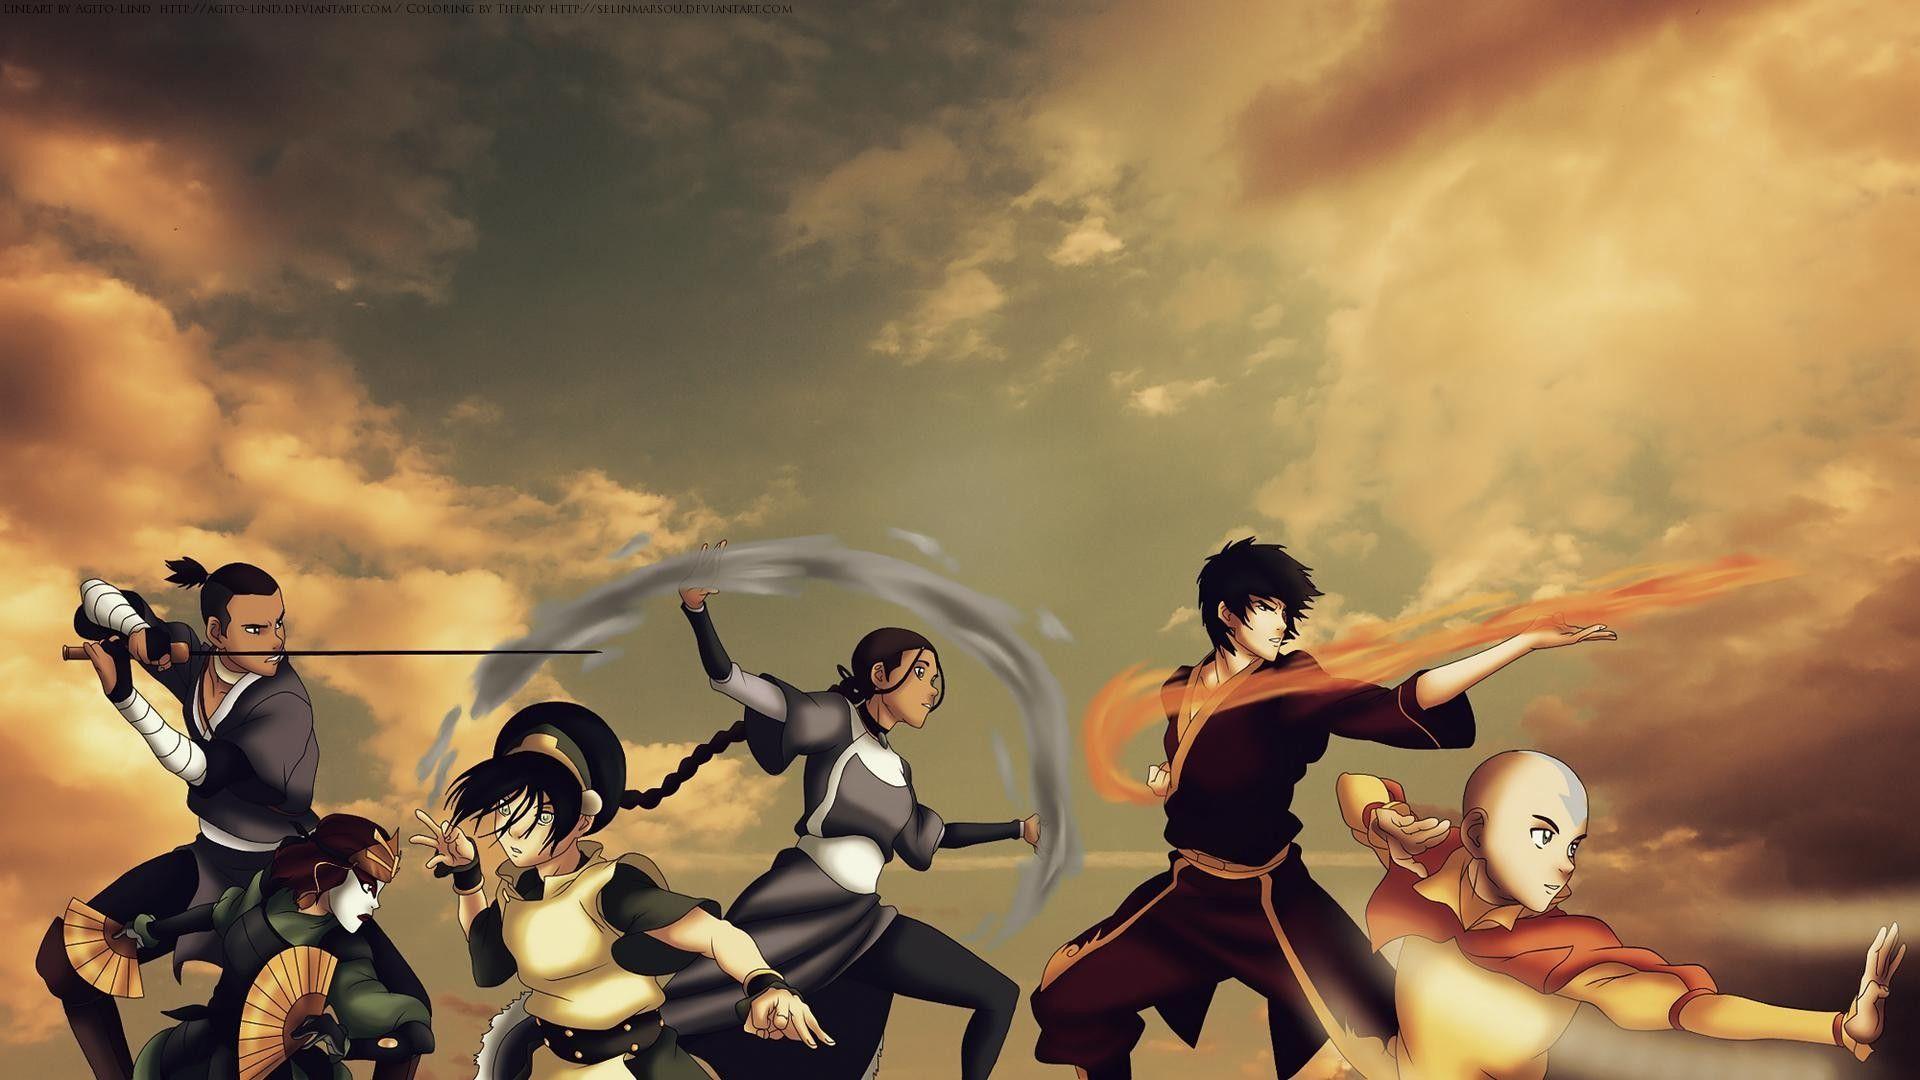 Sokka, Toph Beifong, Avatar The Last Airbender,